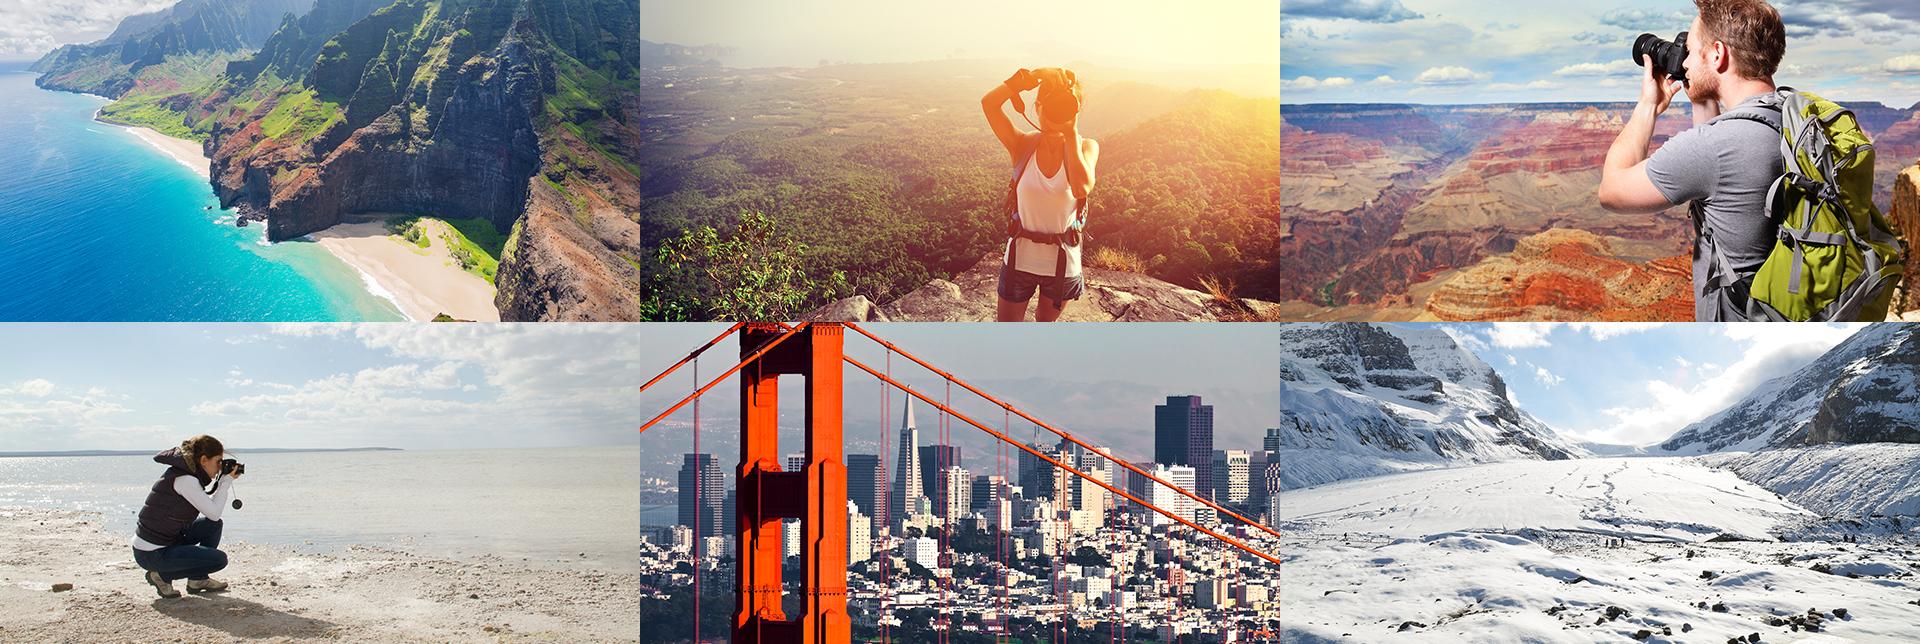 FeaturePhotographerContestPage-Mockup-Photographers